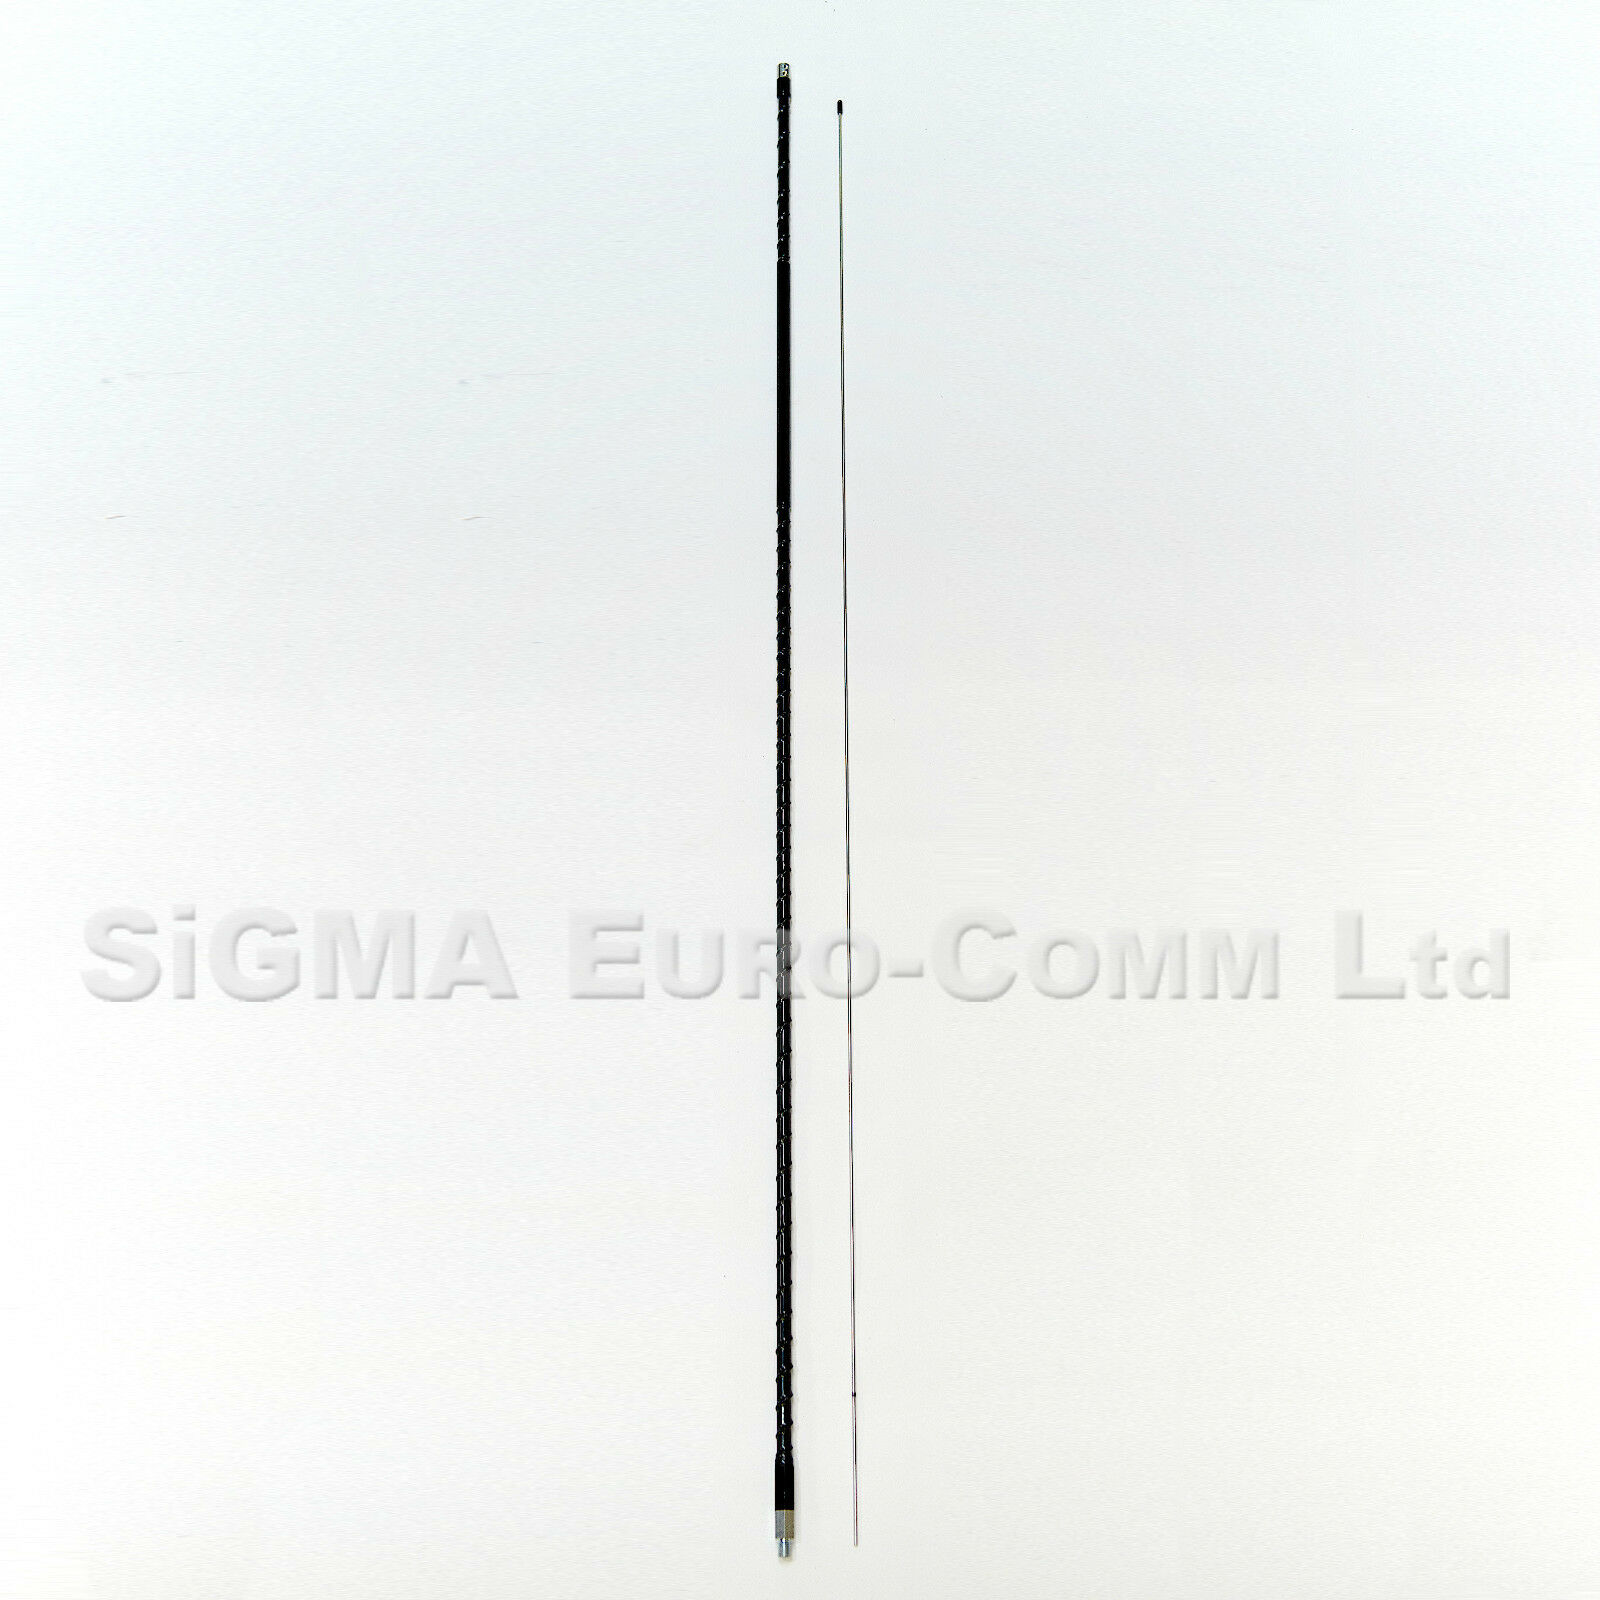 28MHz Mobile Amateur Ham Radio Antenna Diamond HF10CL All Mode 10 Meter